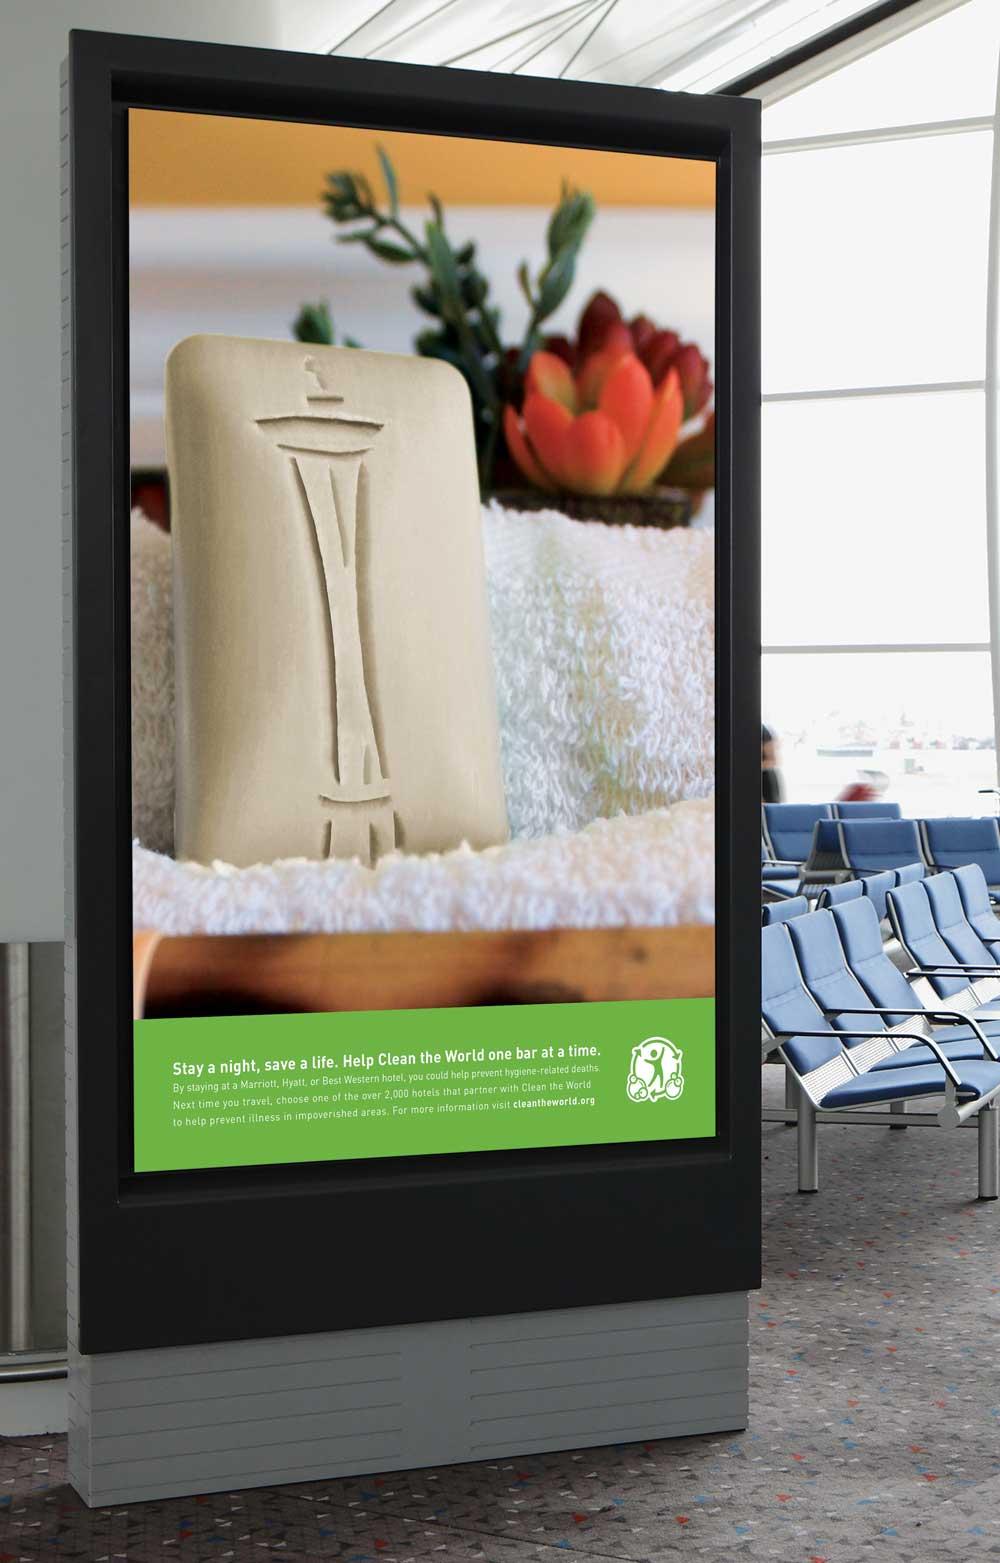 airport-poster-enronmentFA.jpg